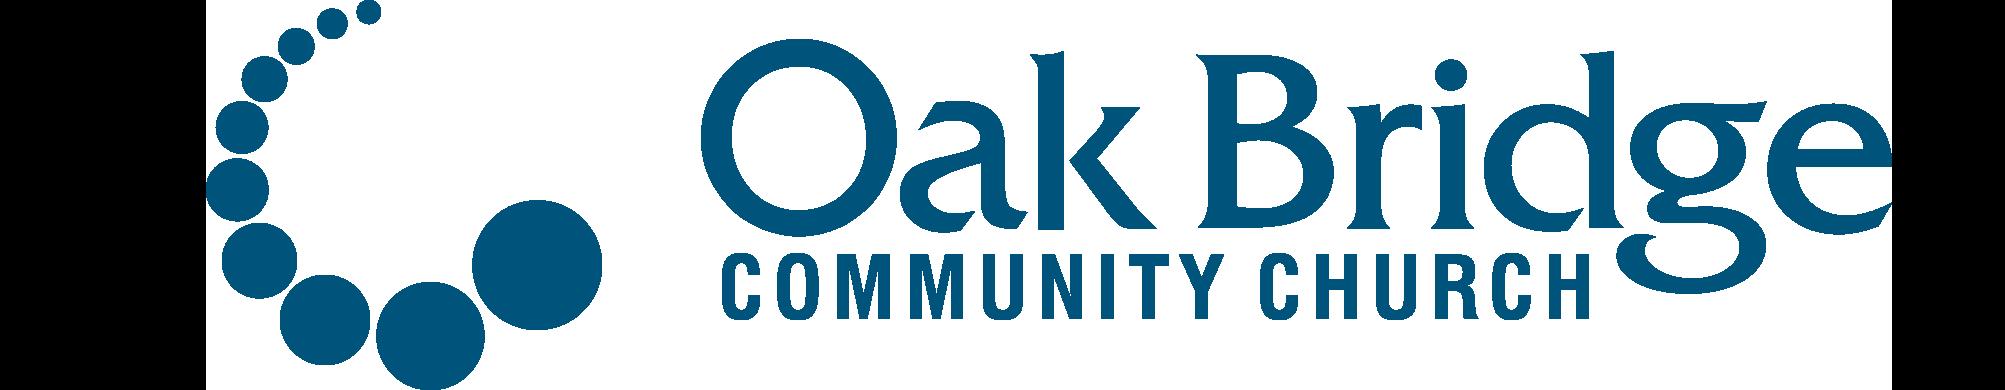 Oak Bridge Community Church